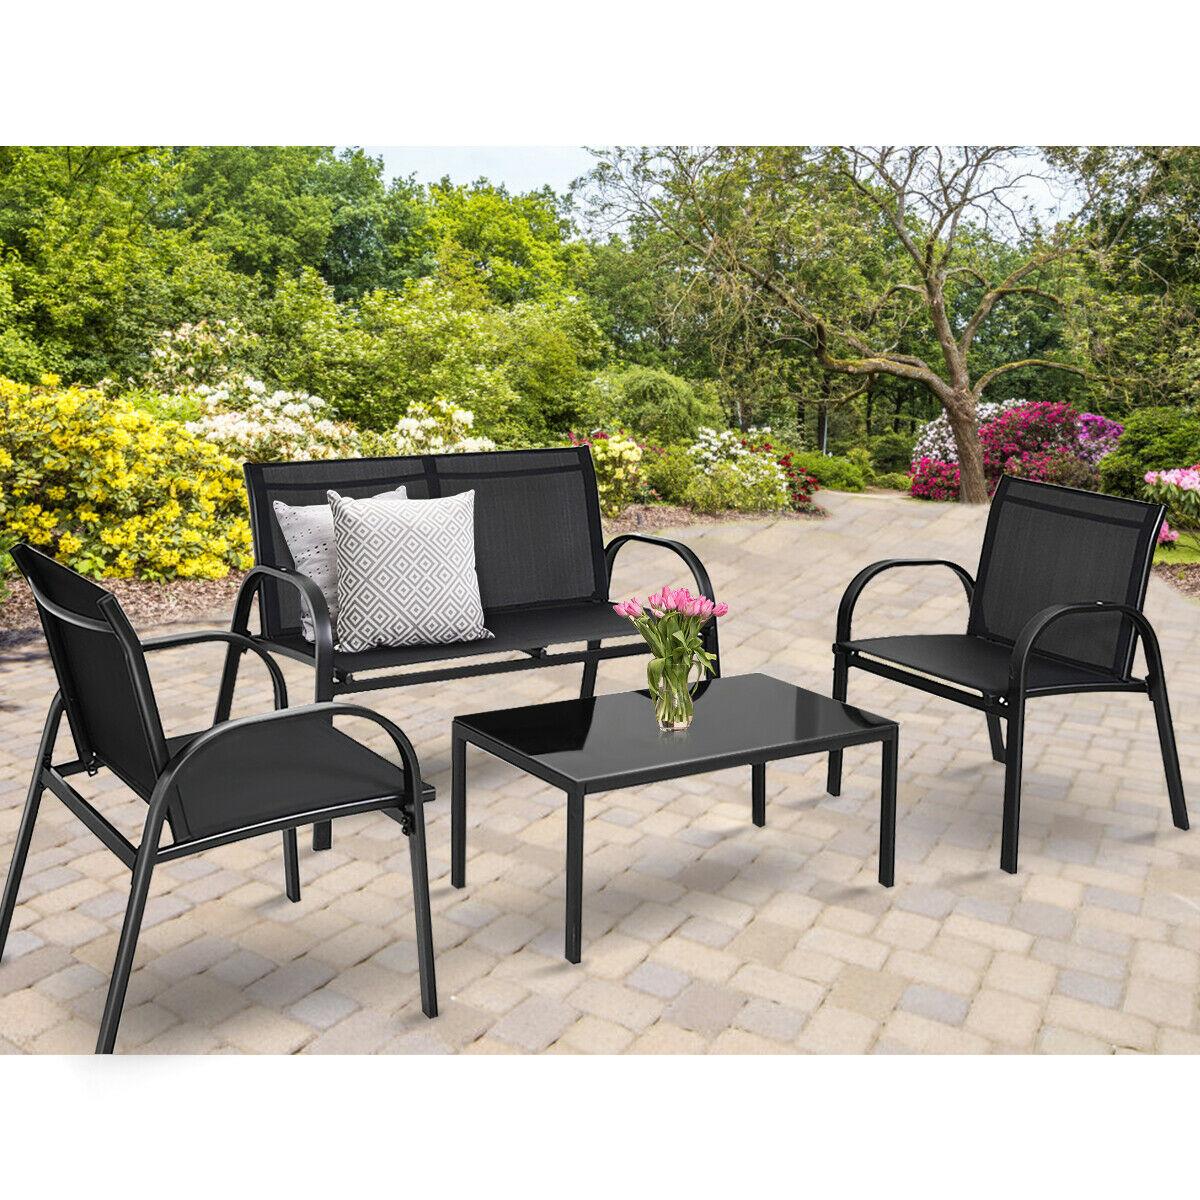 costway 4 pcs patio furniture set sofa coffee table steel frame garden deck black hw65848bk